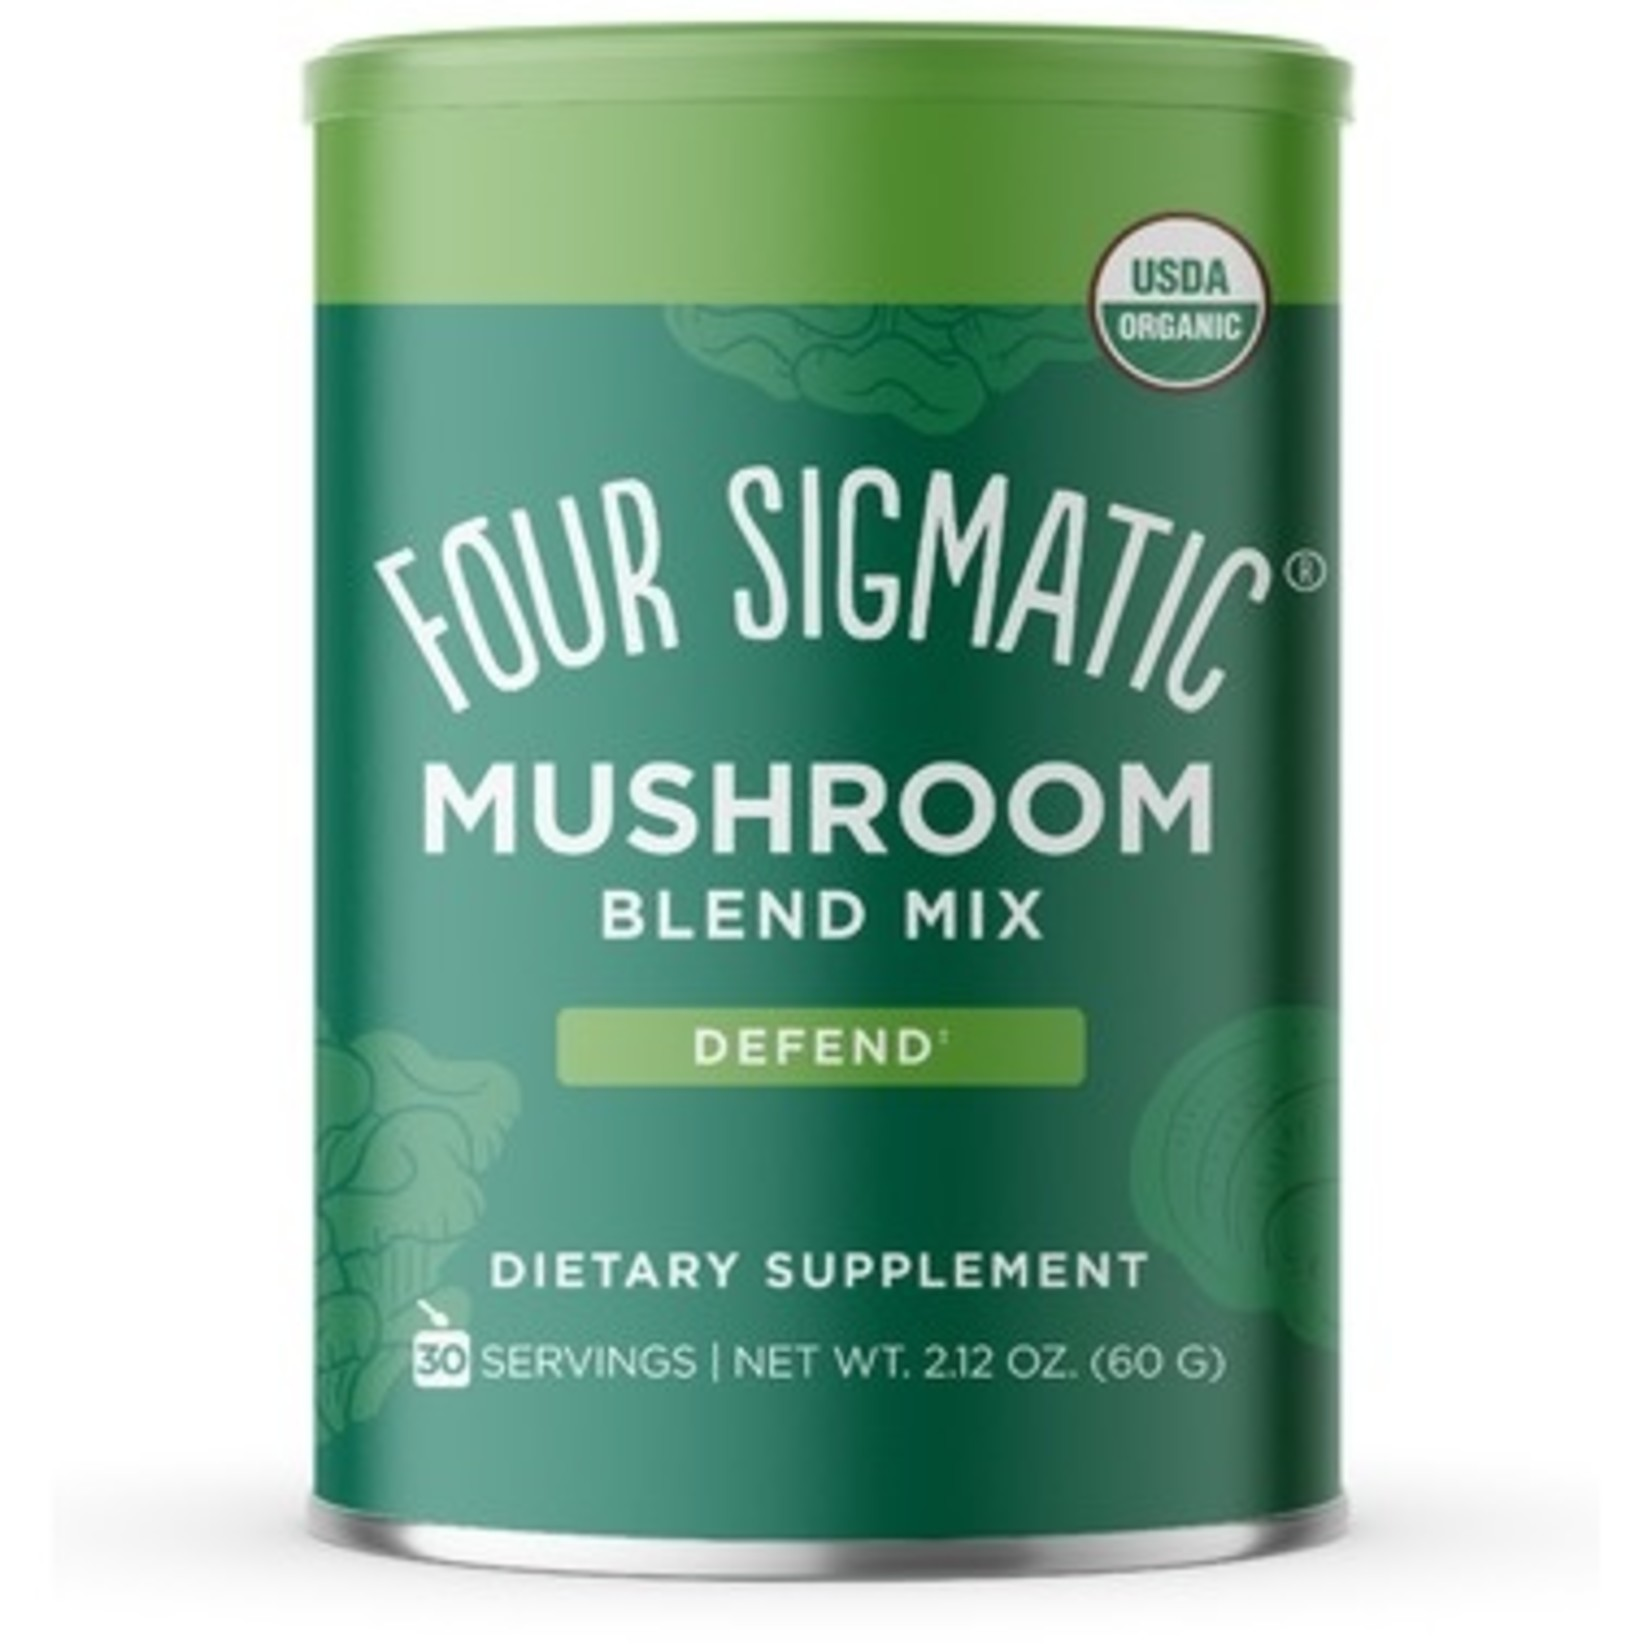 Four Sigmatic Mushroom Blend Mix 60g